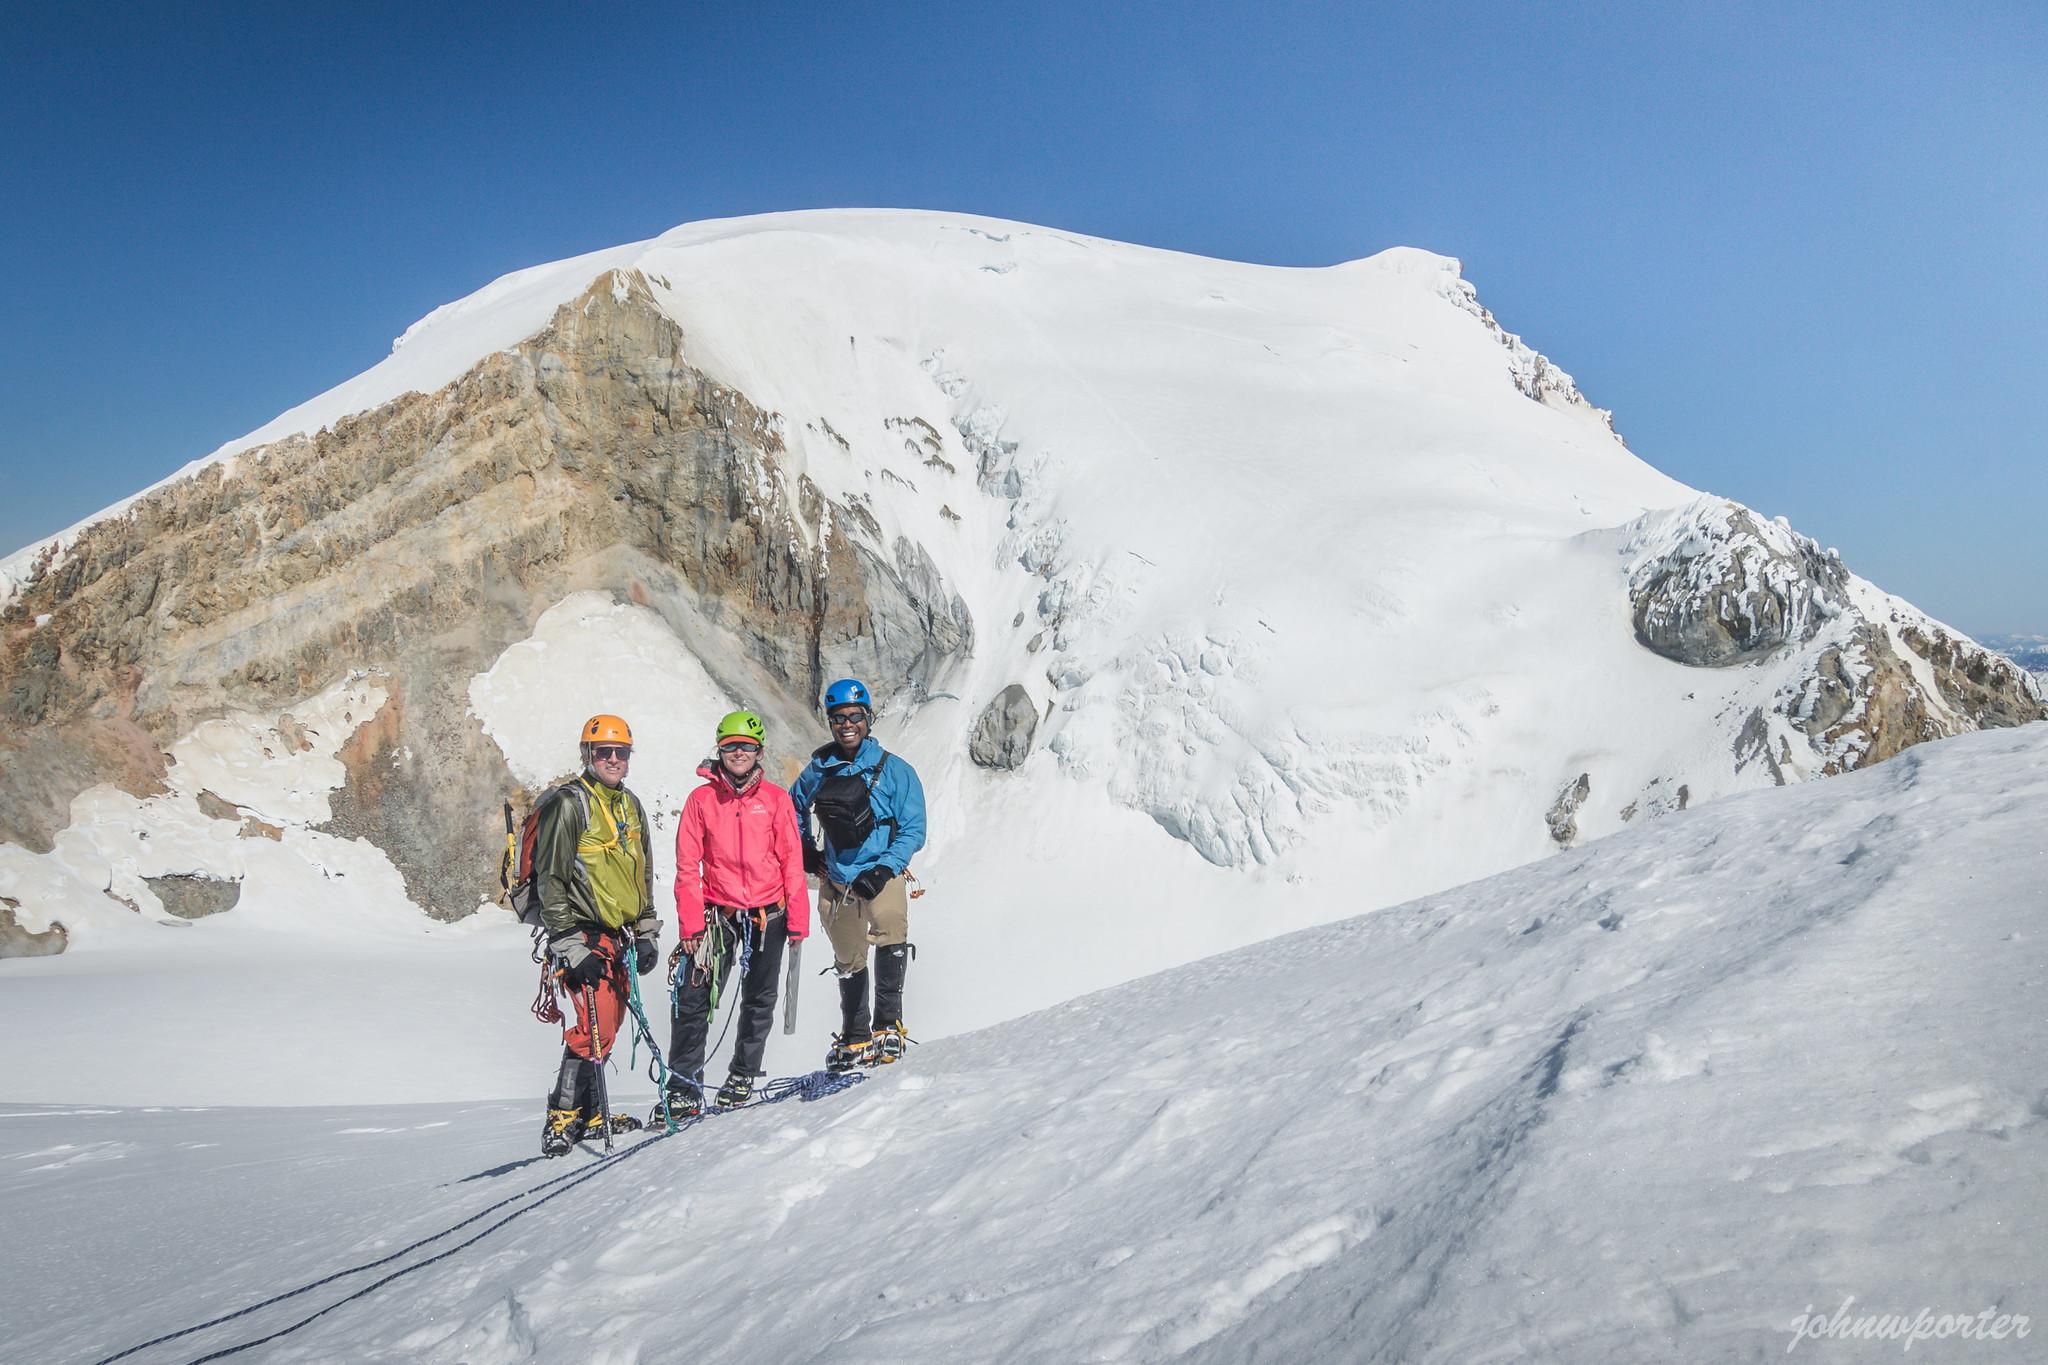 Group Kodak moment on Sherman Peak